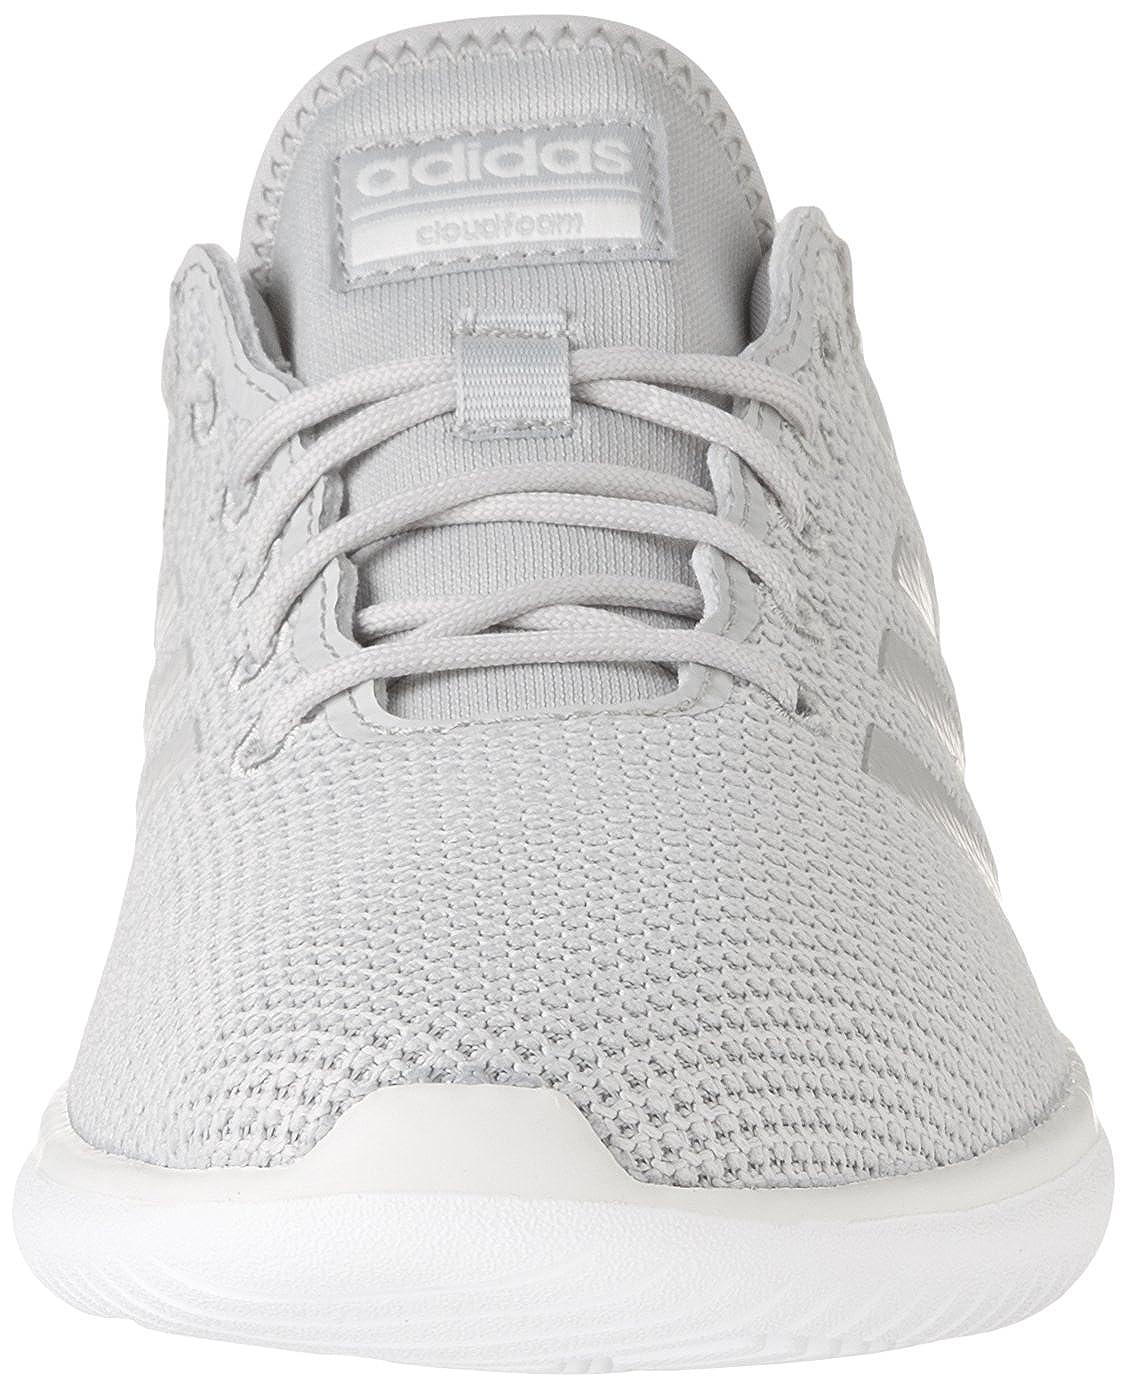 bb62b23224028c adidas NEO Damen Sneaker CF QTFLex Freizeitschuh Schnürer Cloudfoam Grau